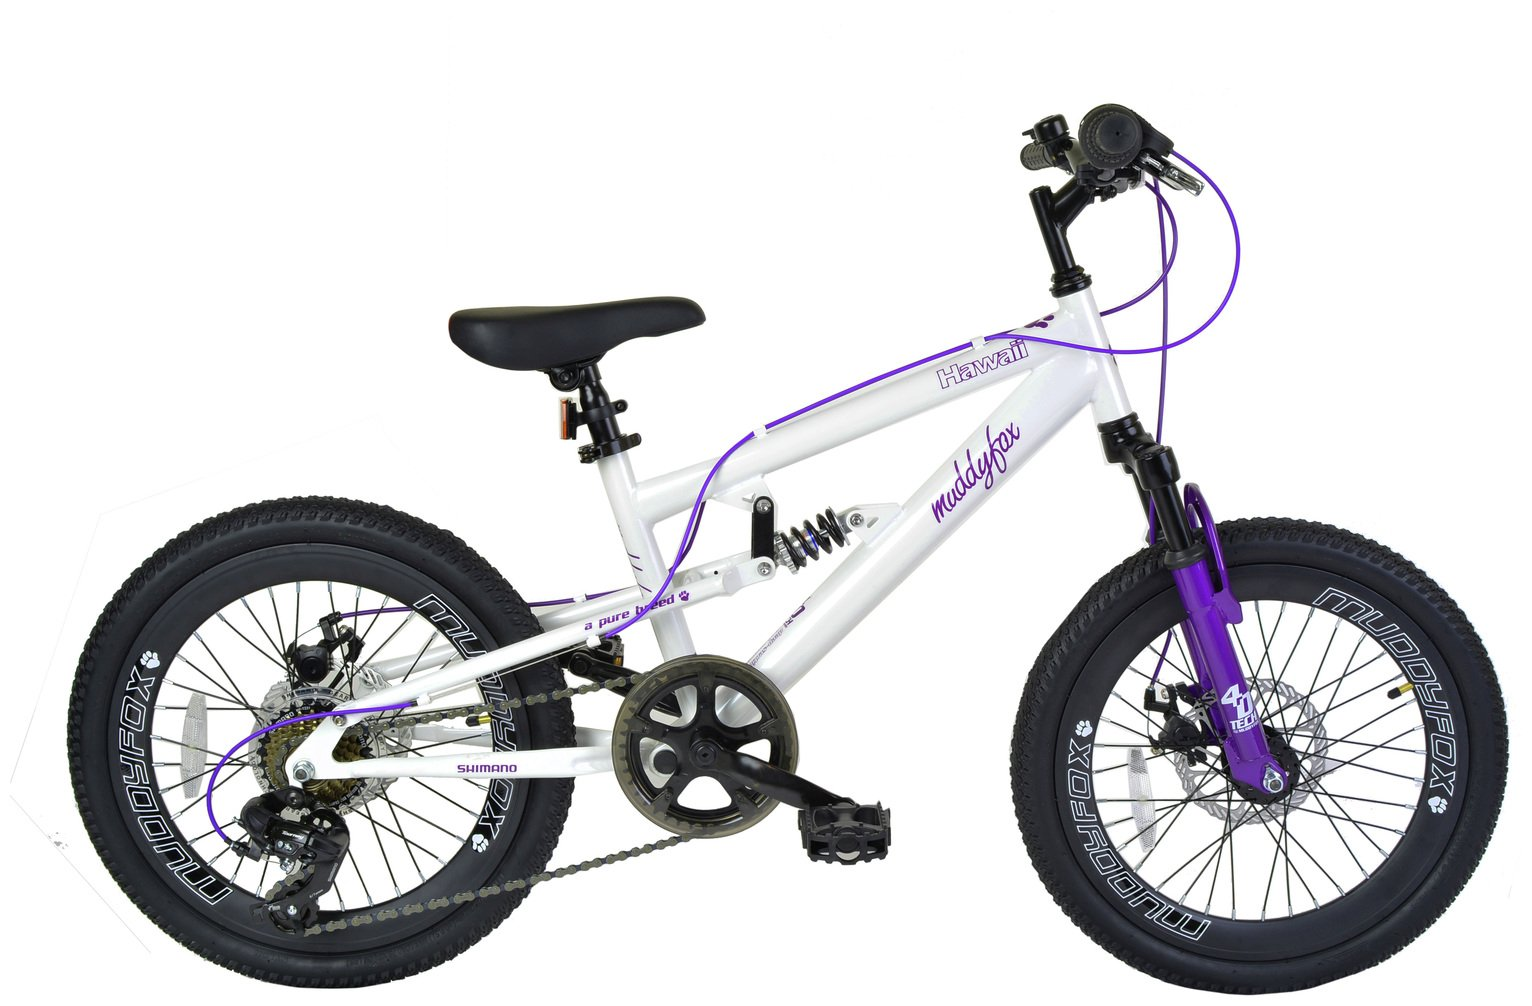 Muddyfox Hawaii 20 Inch Dual Suspension Kids Bike